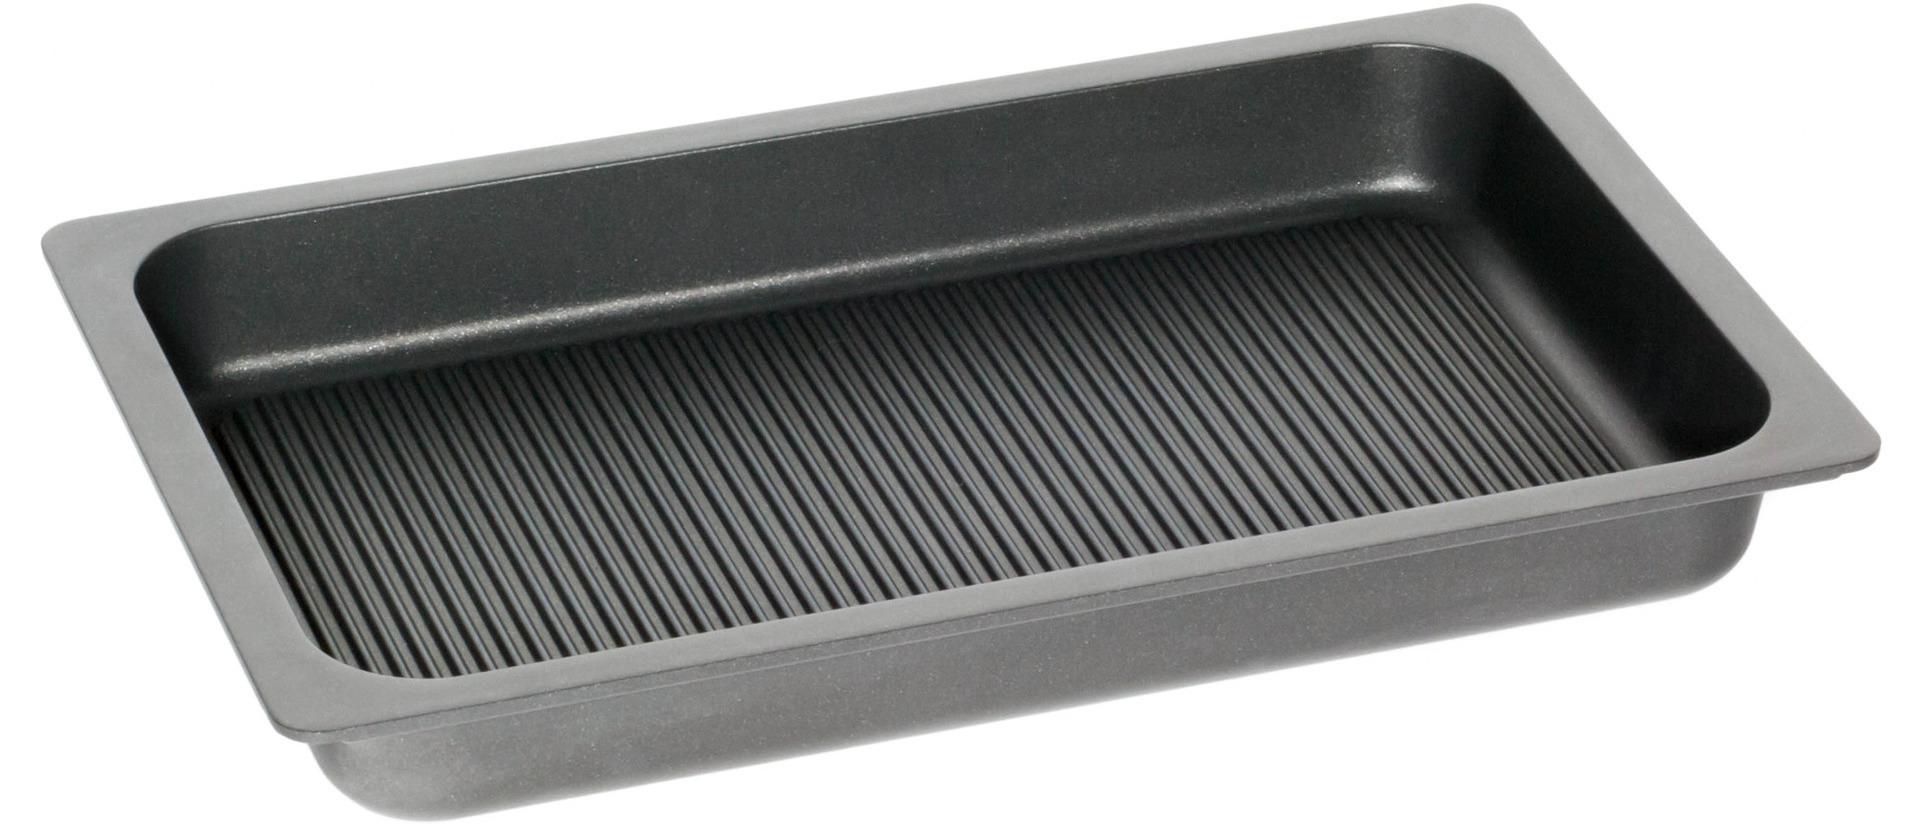 GN-Bratplatte GN 1/1 Grillboden 7,00 l / 530 x 330 x 55 mm